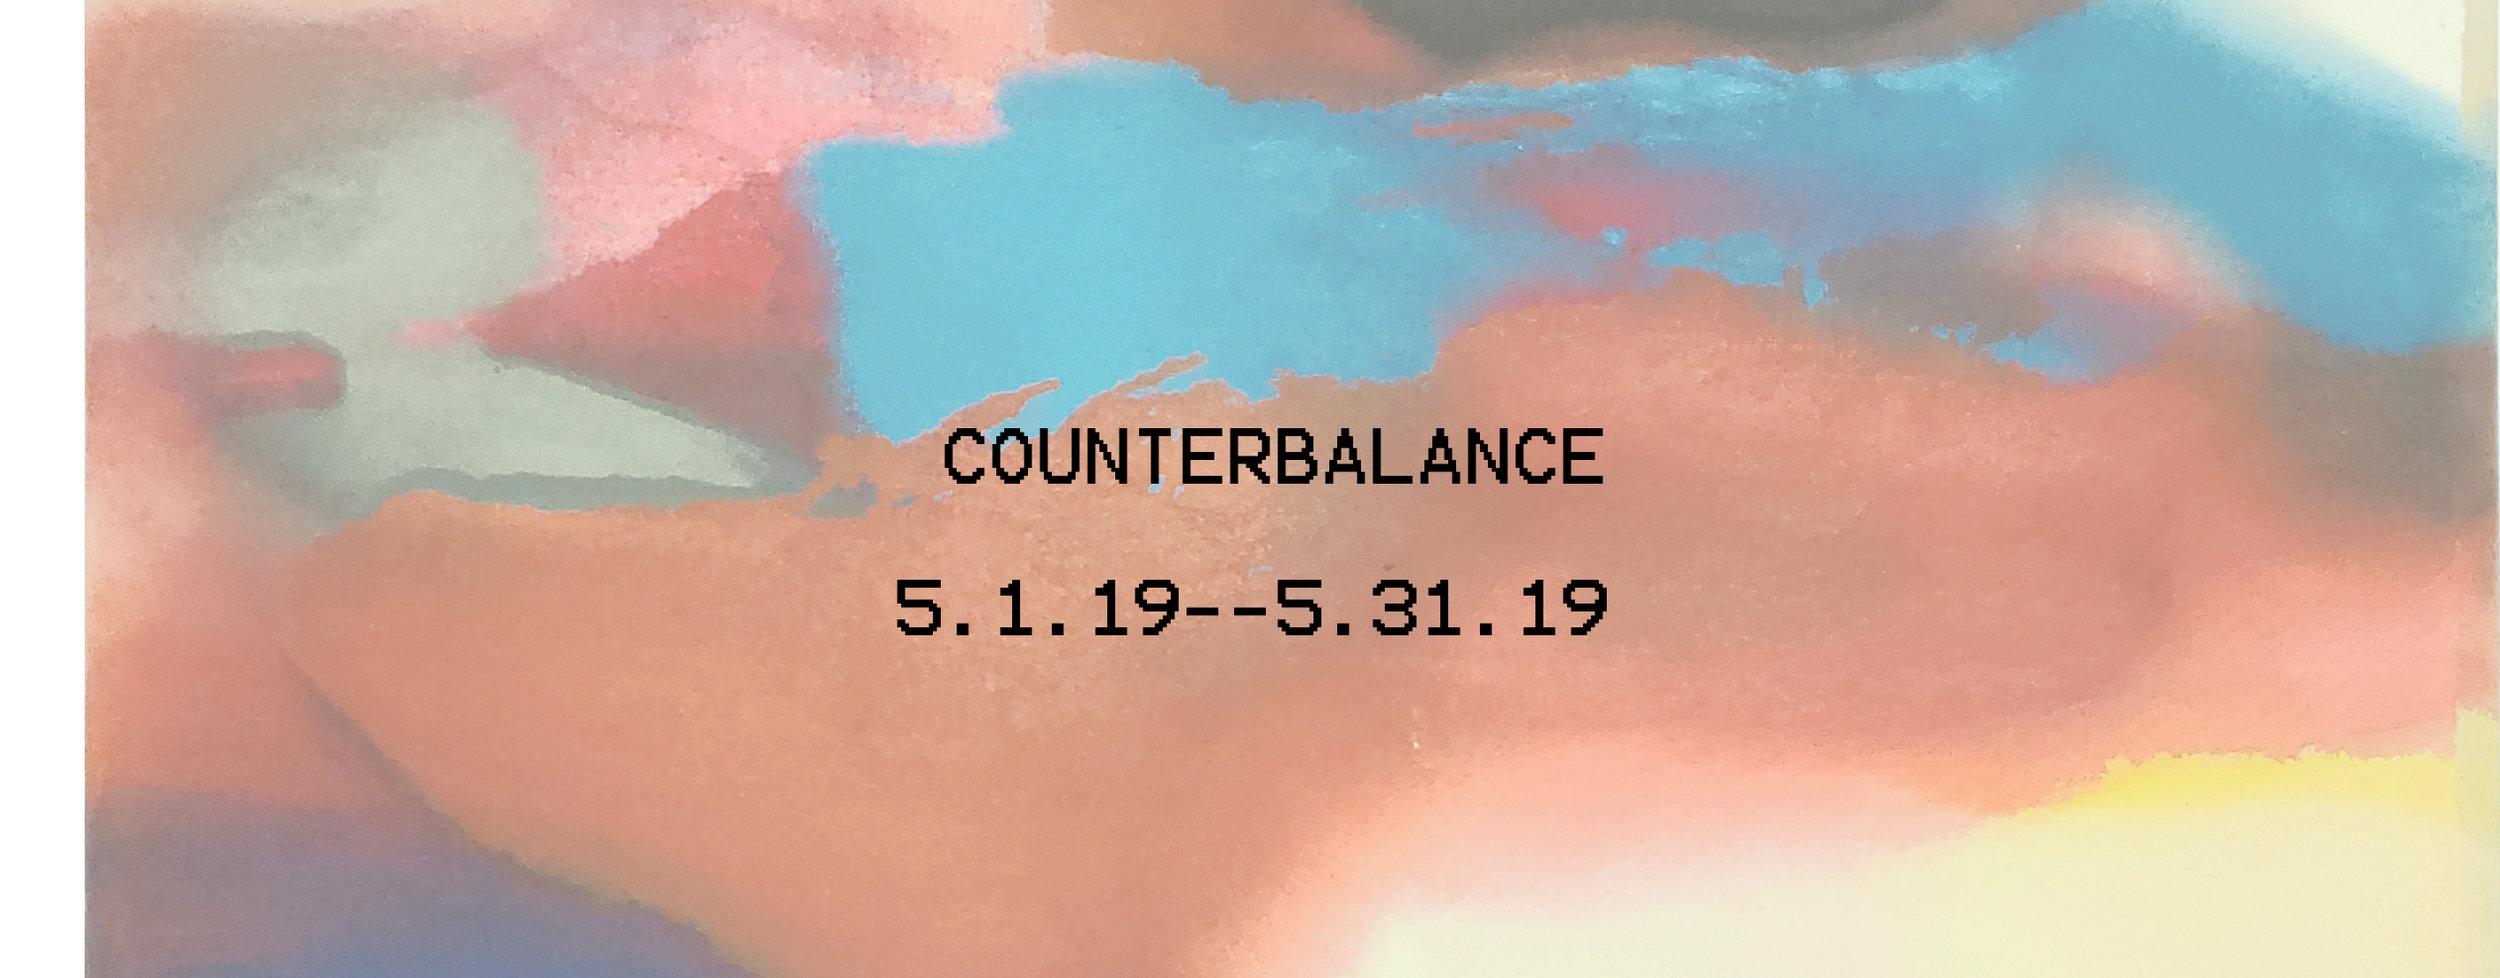 counterbalance_logo